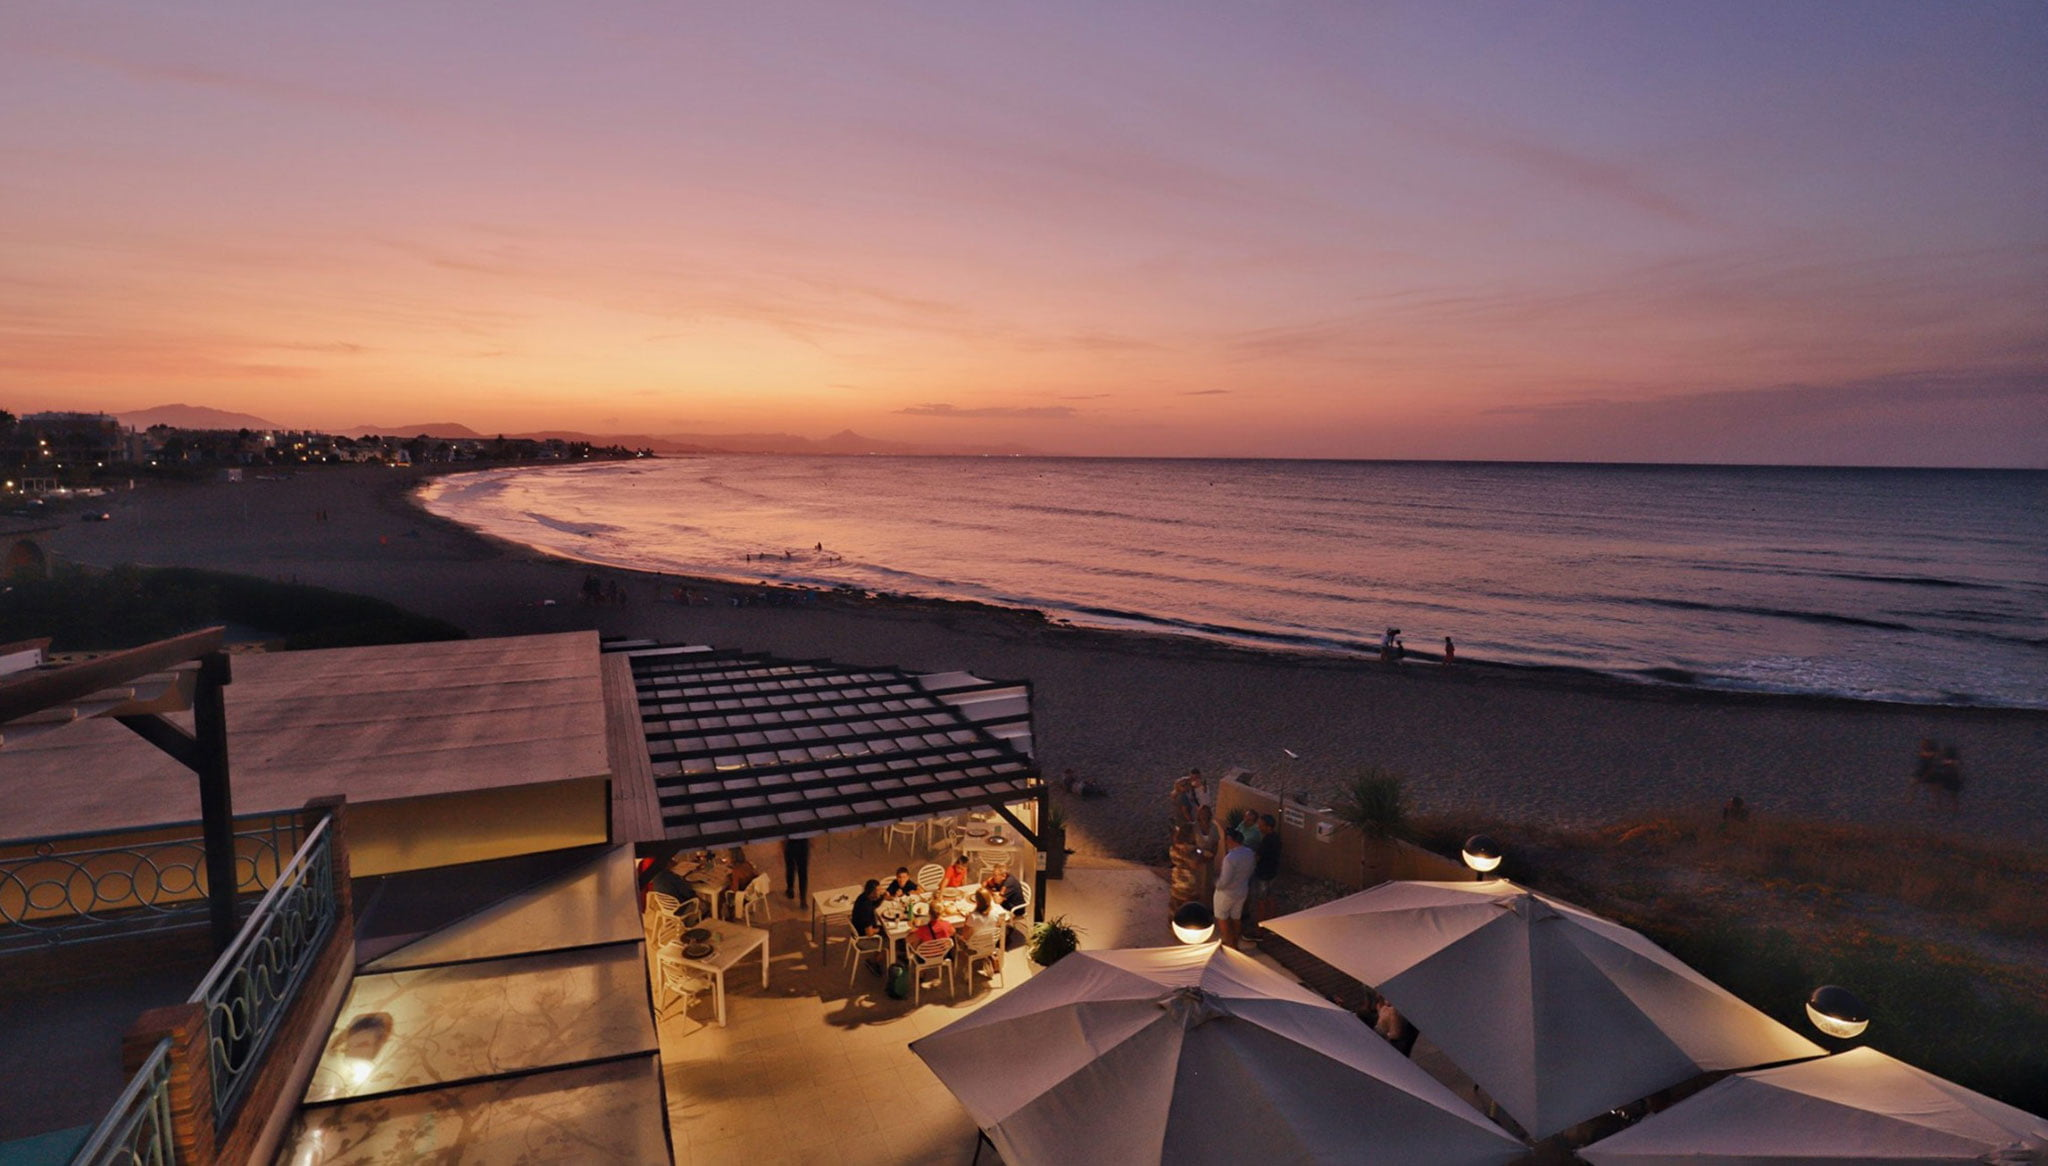 Atardeceres increíbles en Dénia en Restaurant Noguera